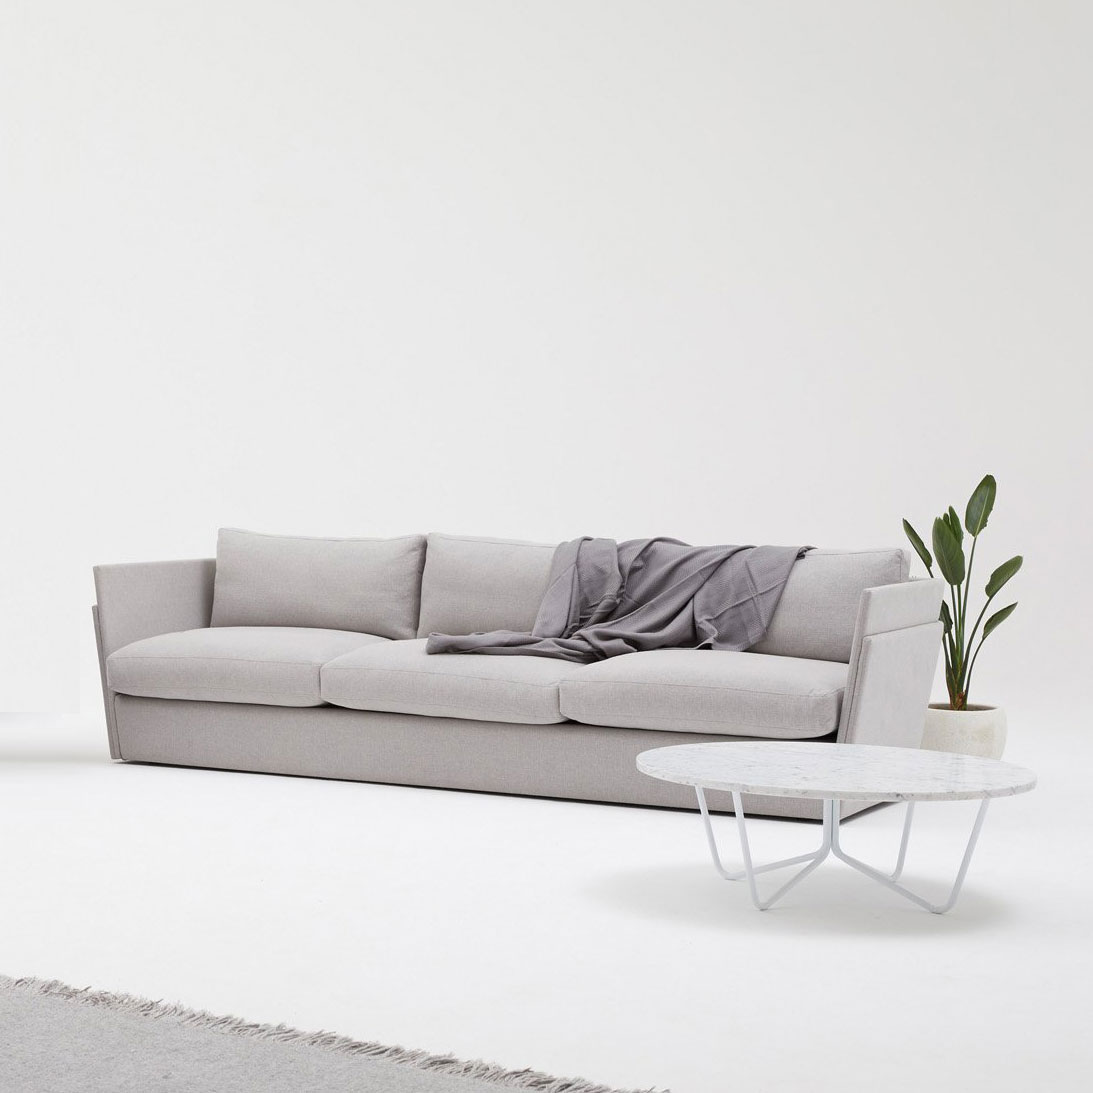 furniture-timwebber-layer-sofa4.jpg